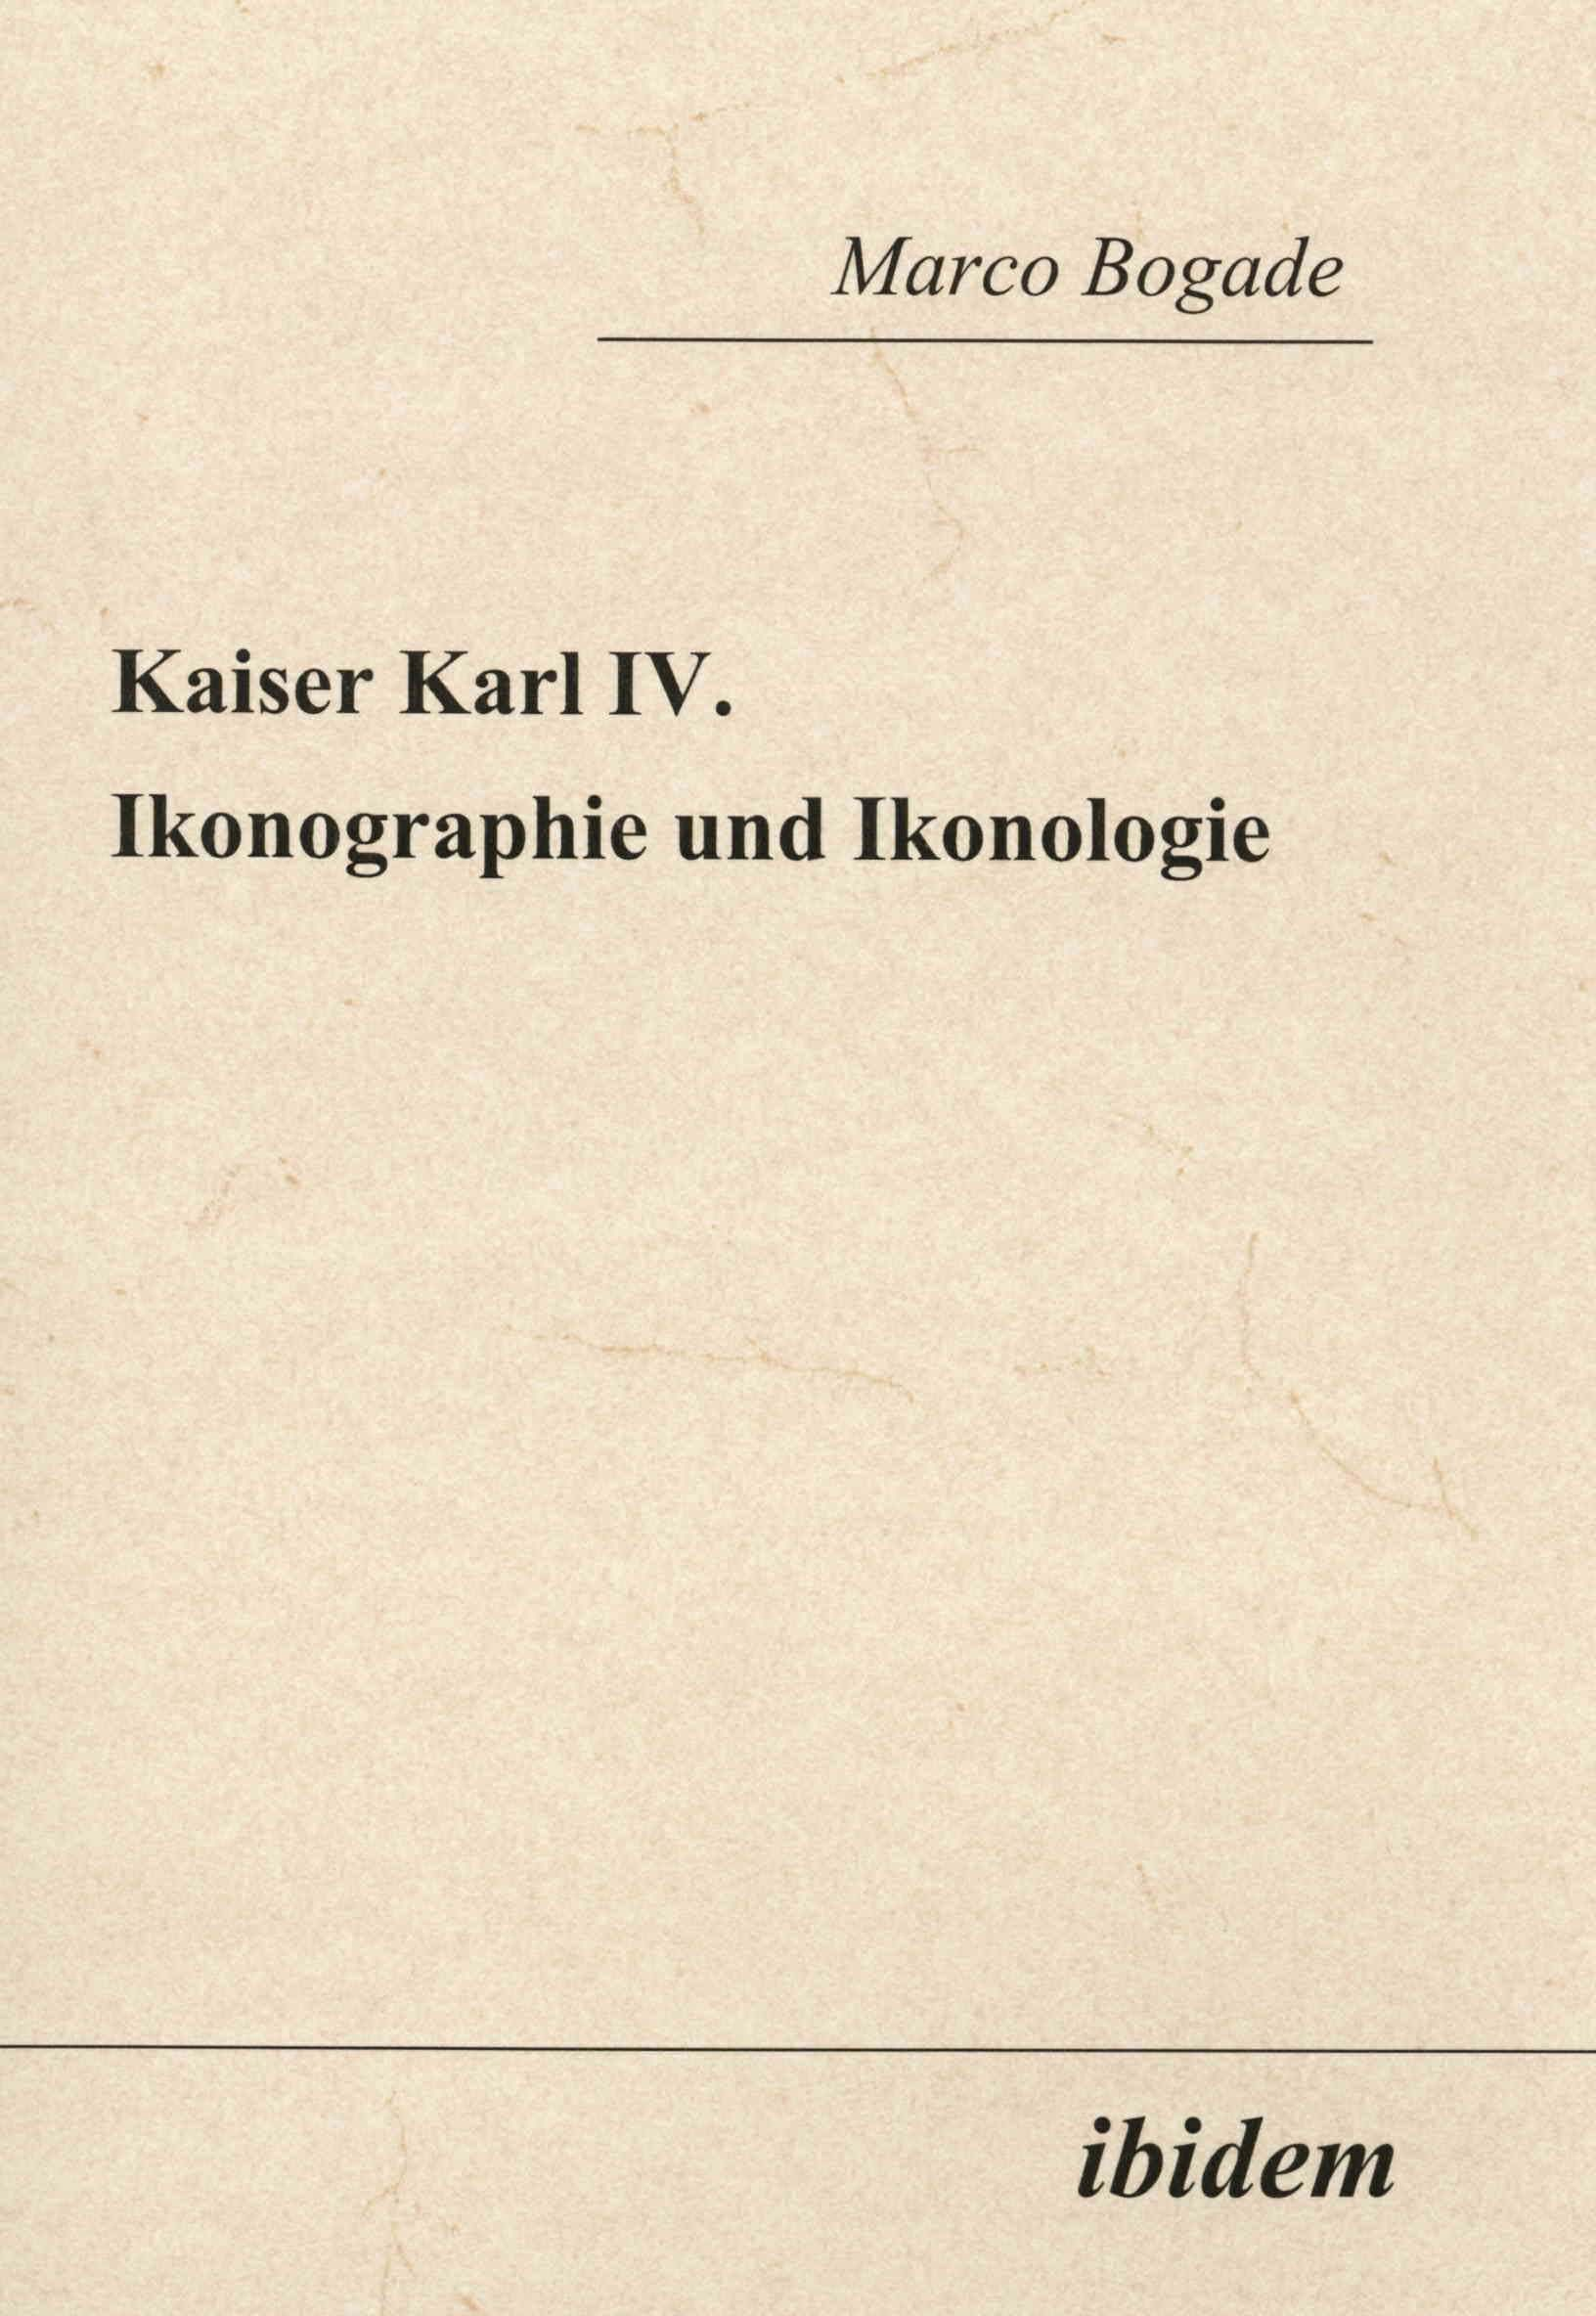 Kaiser Karl IV. - Ikonographie und Ikonologie